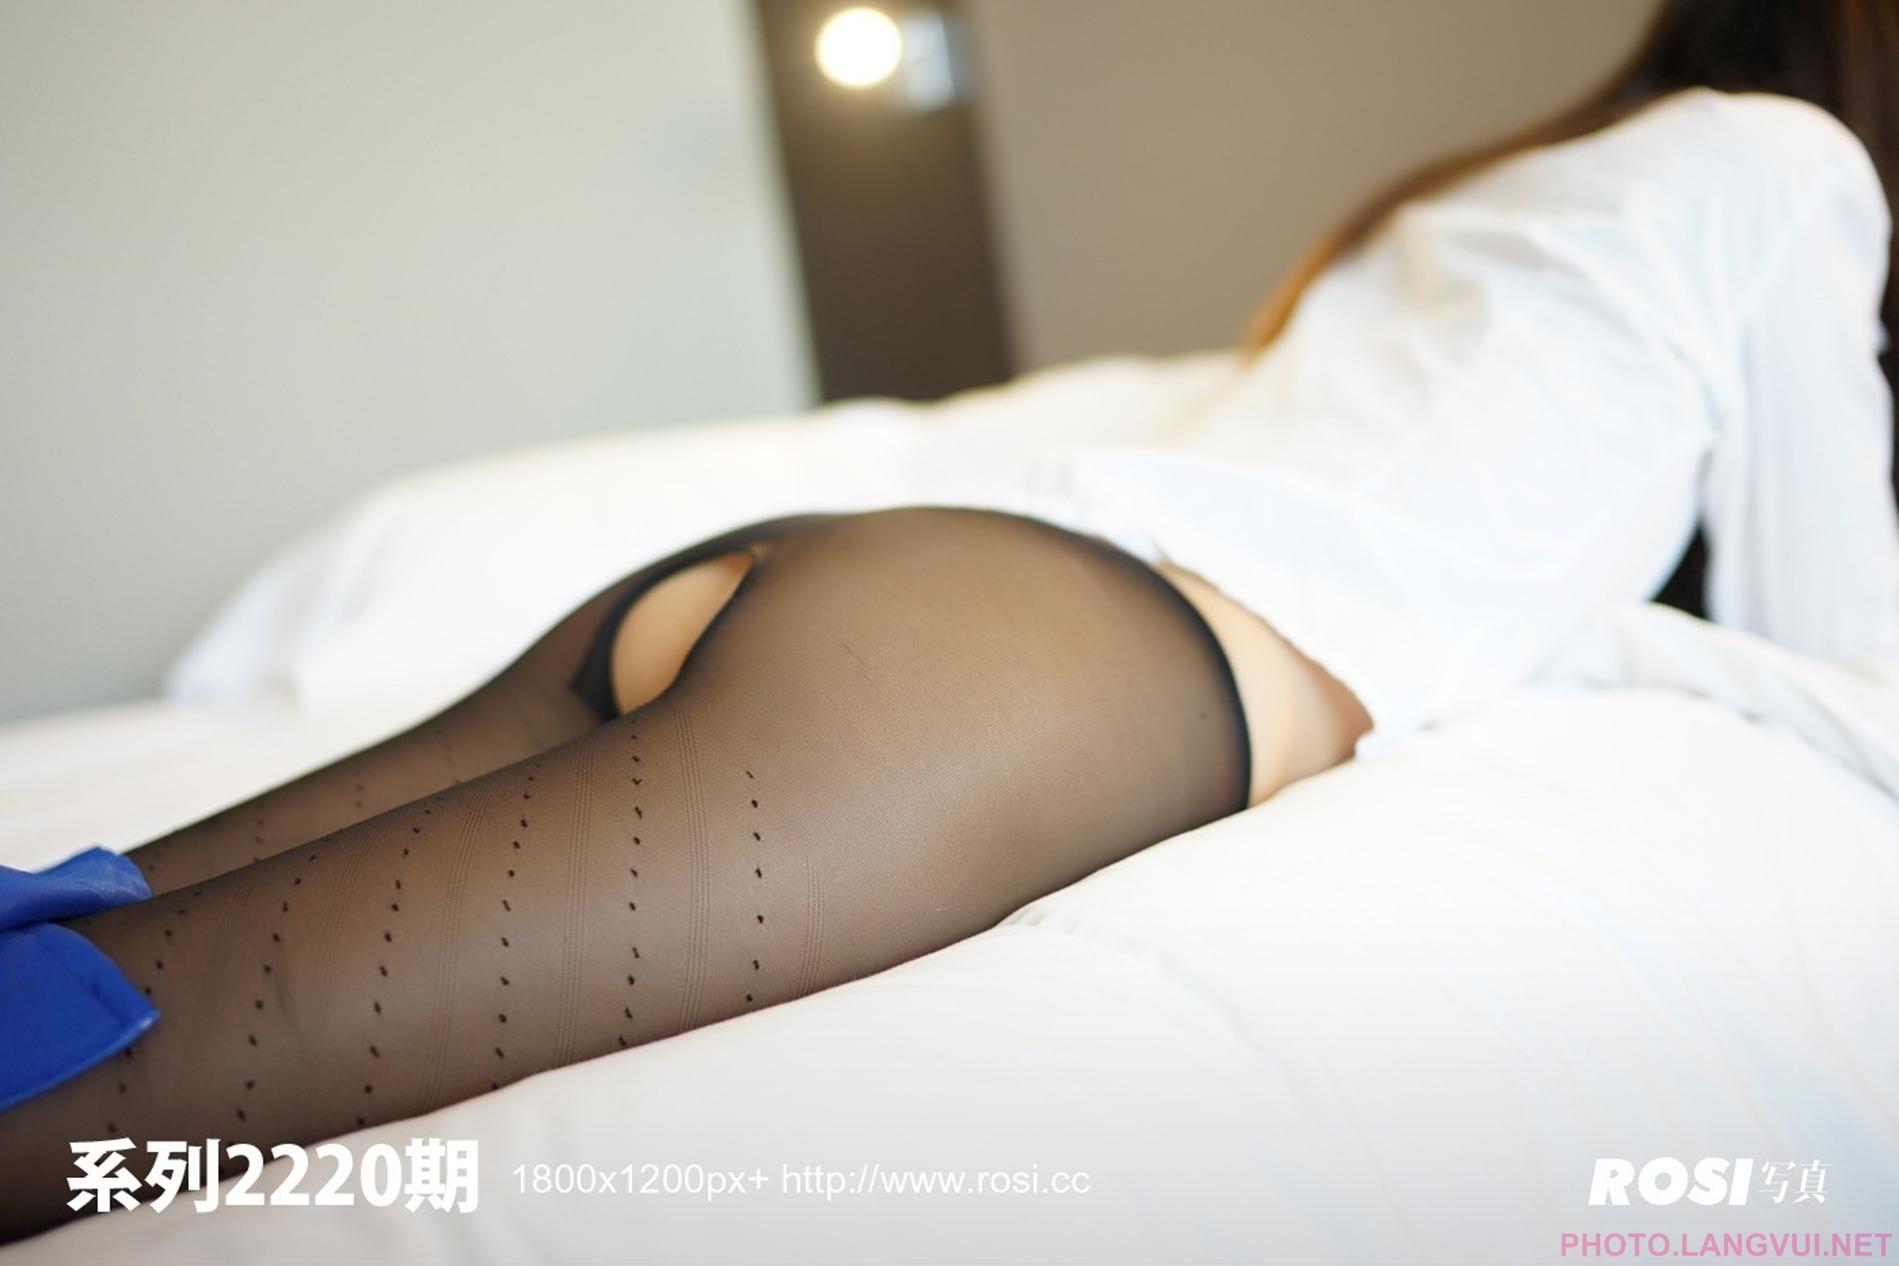 ROSI No 2220